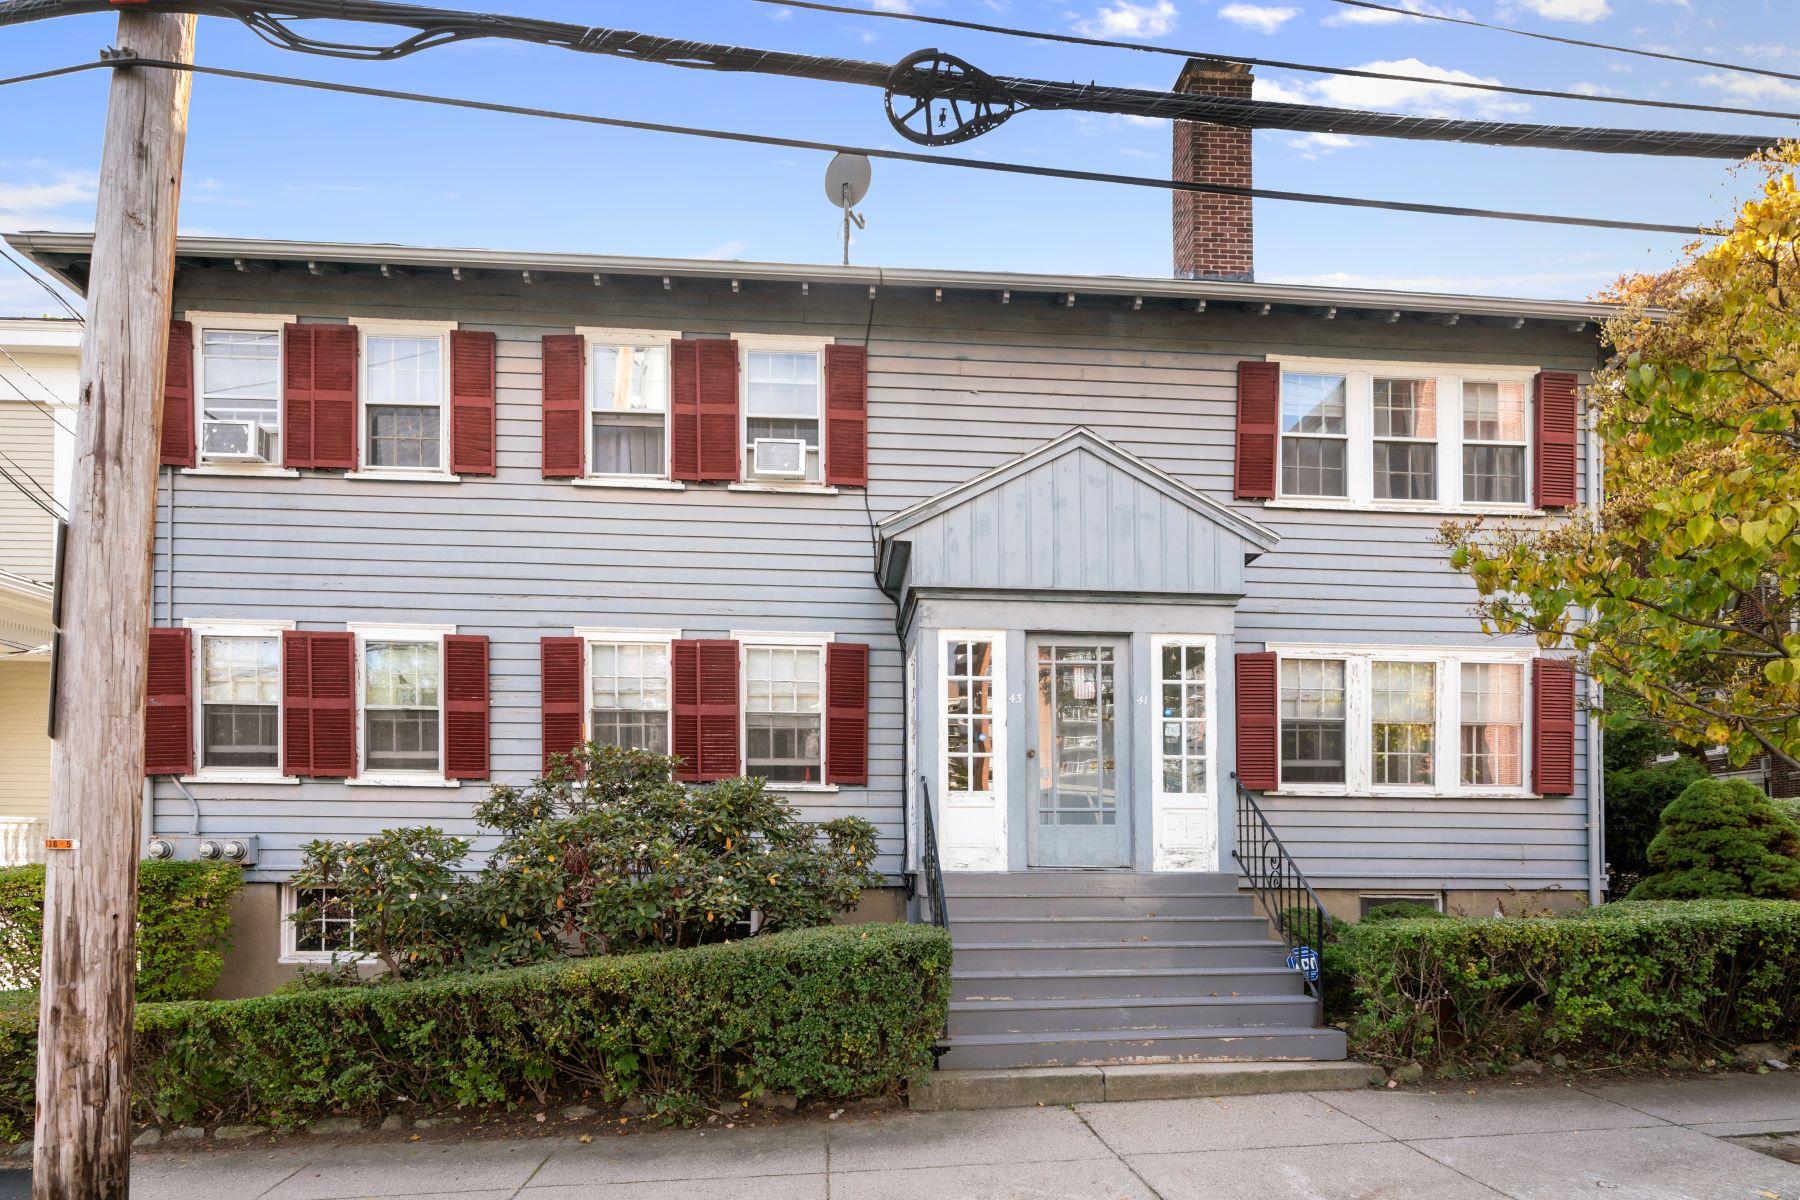 Multi-Family Homes 为 销售 在 41 Stearns Rd 41-43 Stearns Rd 布鲁克莱恩, 马萨诸塞州 02446 美国